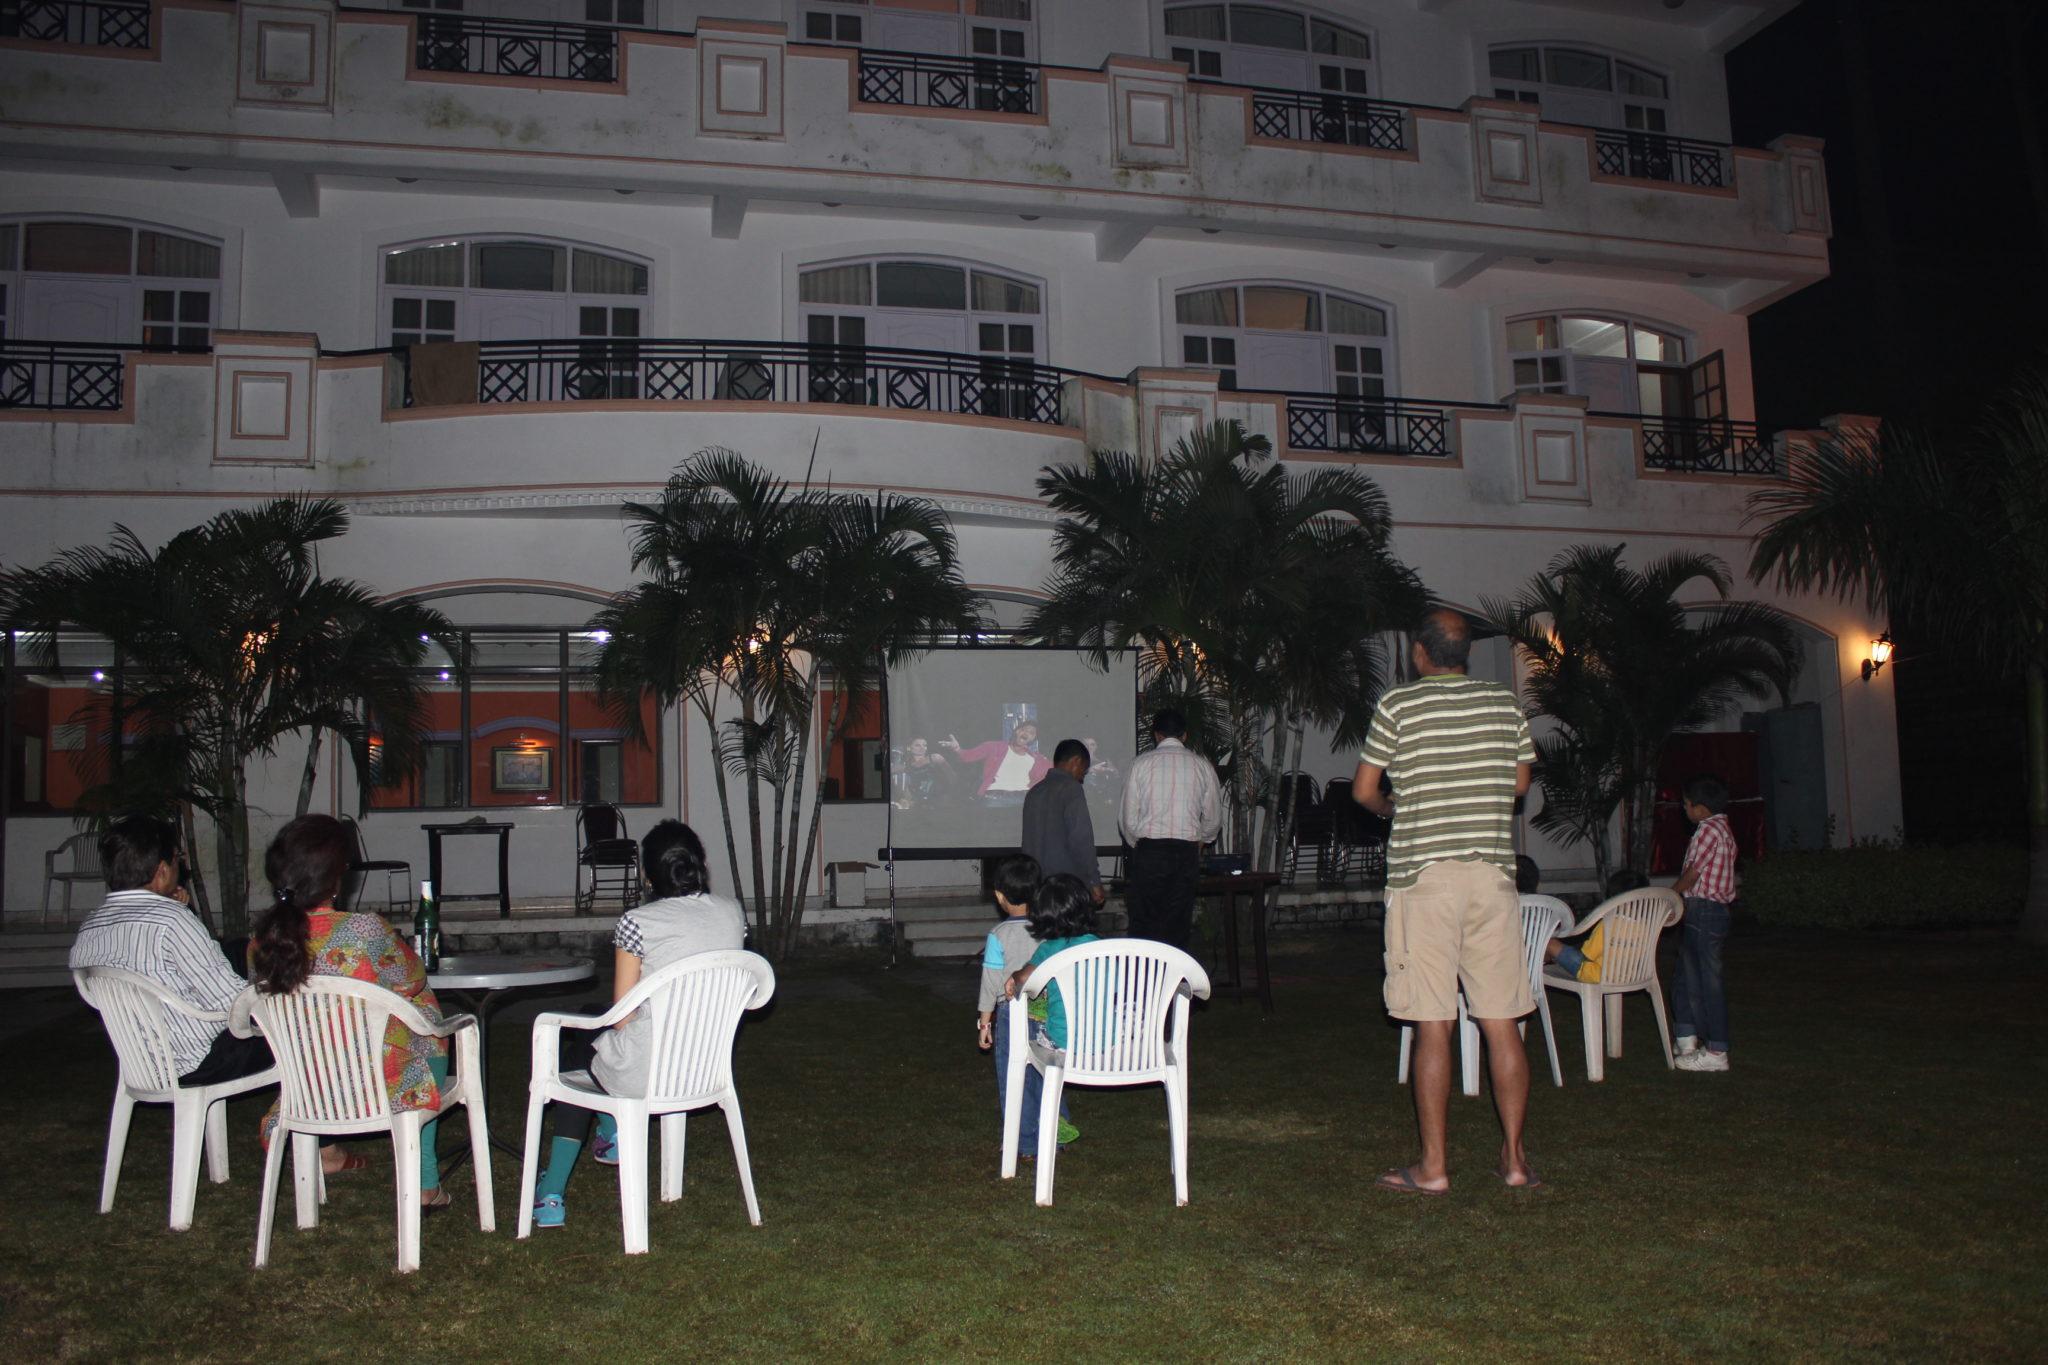 Golmaal 3 in the evening